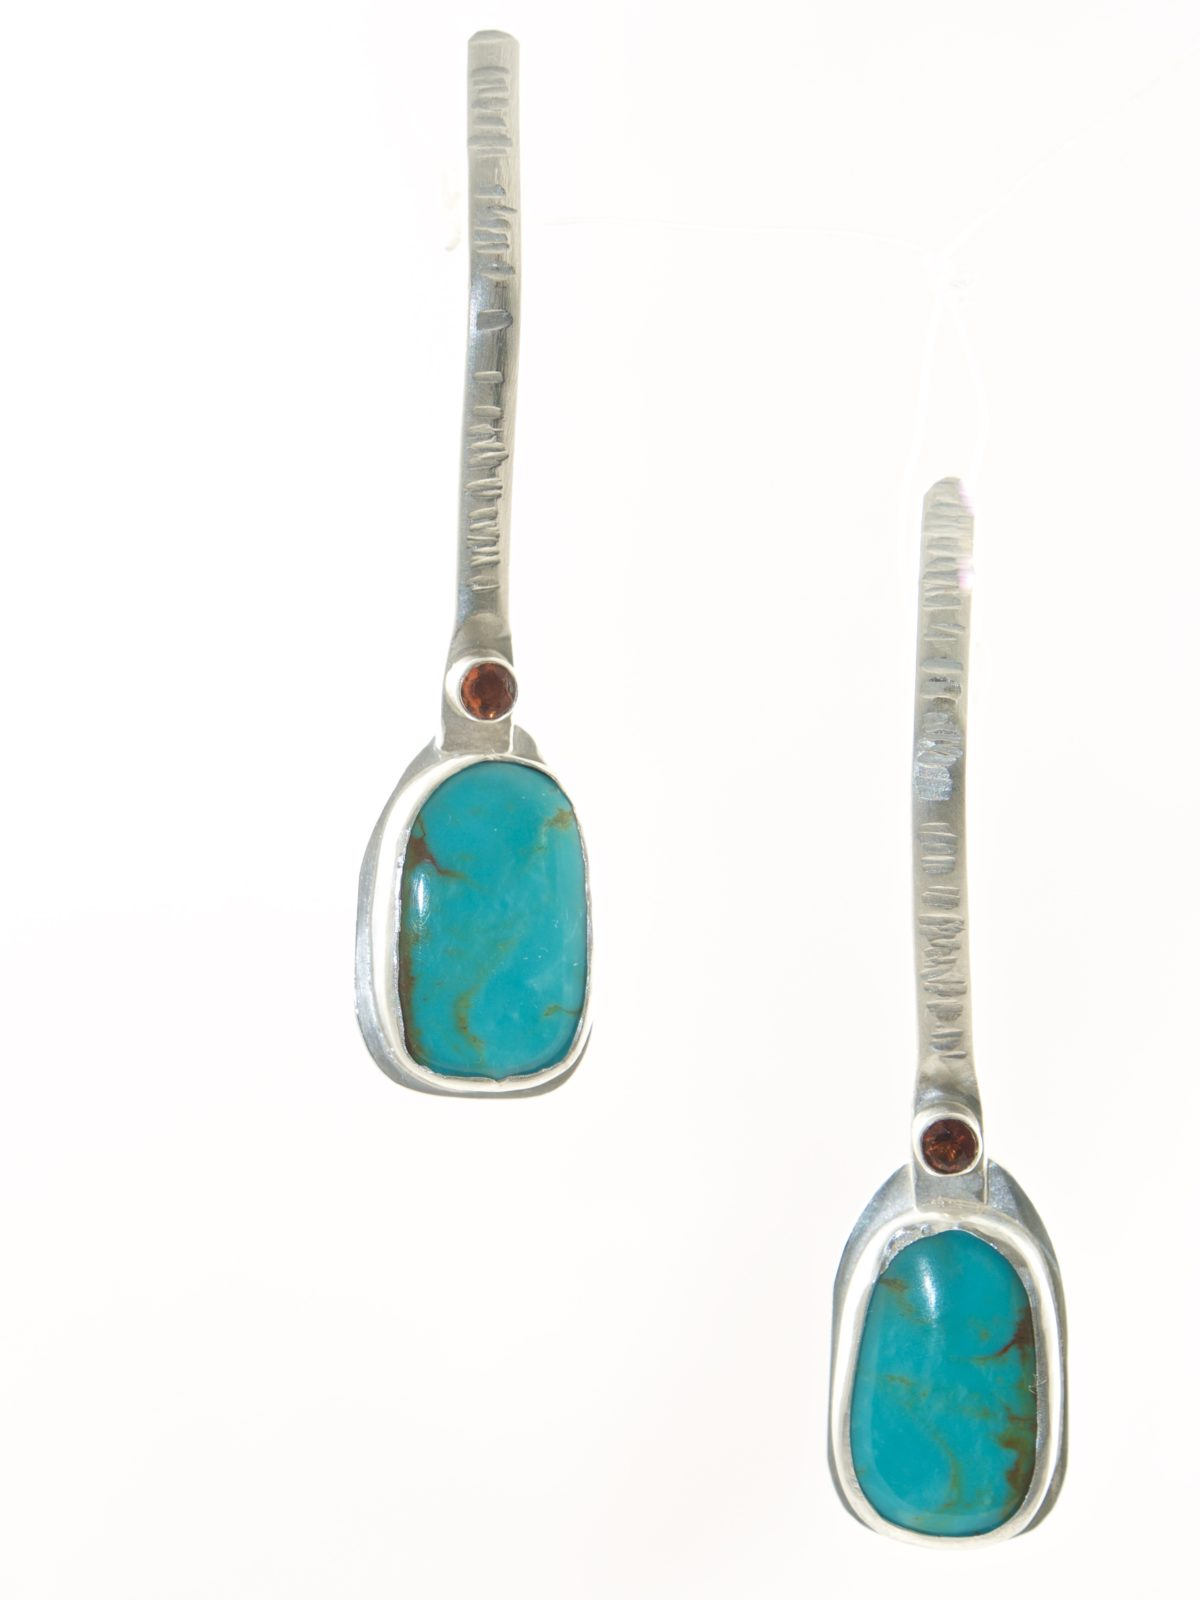 Kingsman Turquoise Earrings